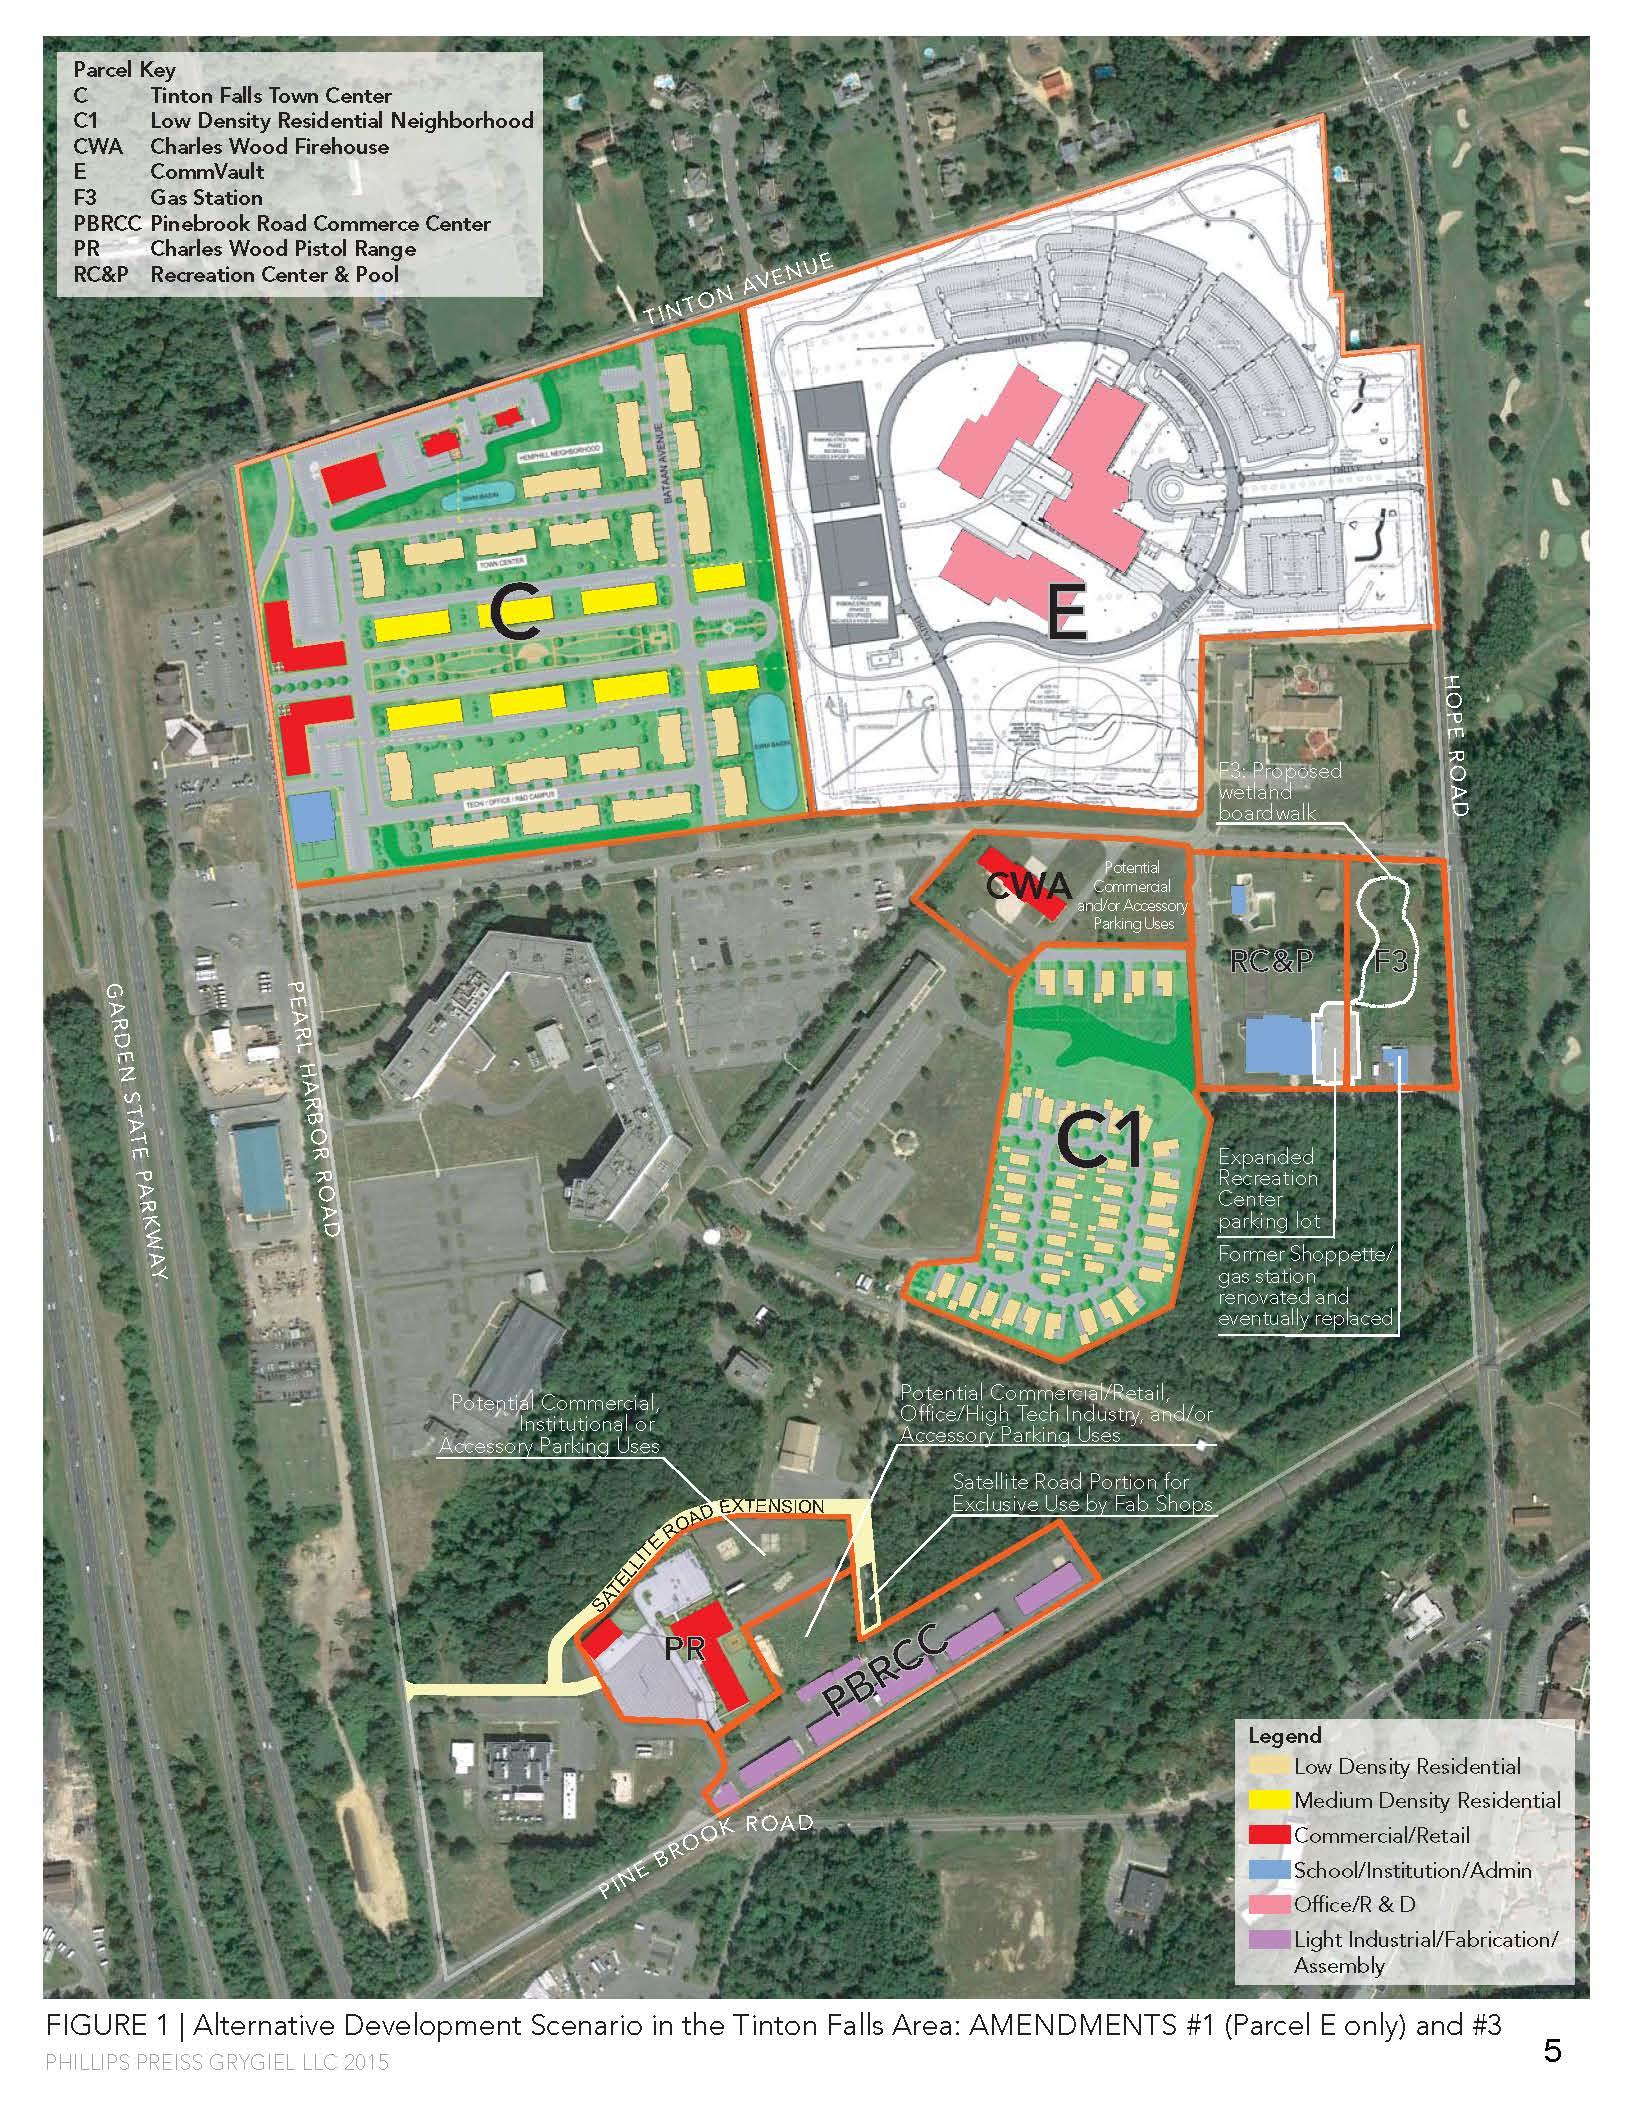 Map from Tinton Falls_Reuse Plan Amendment_3